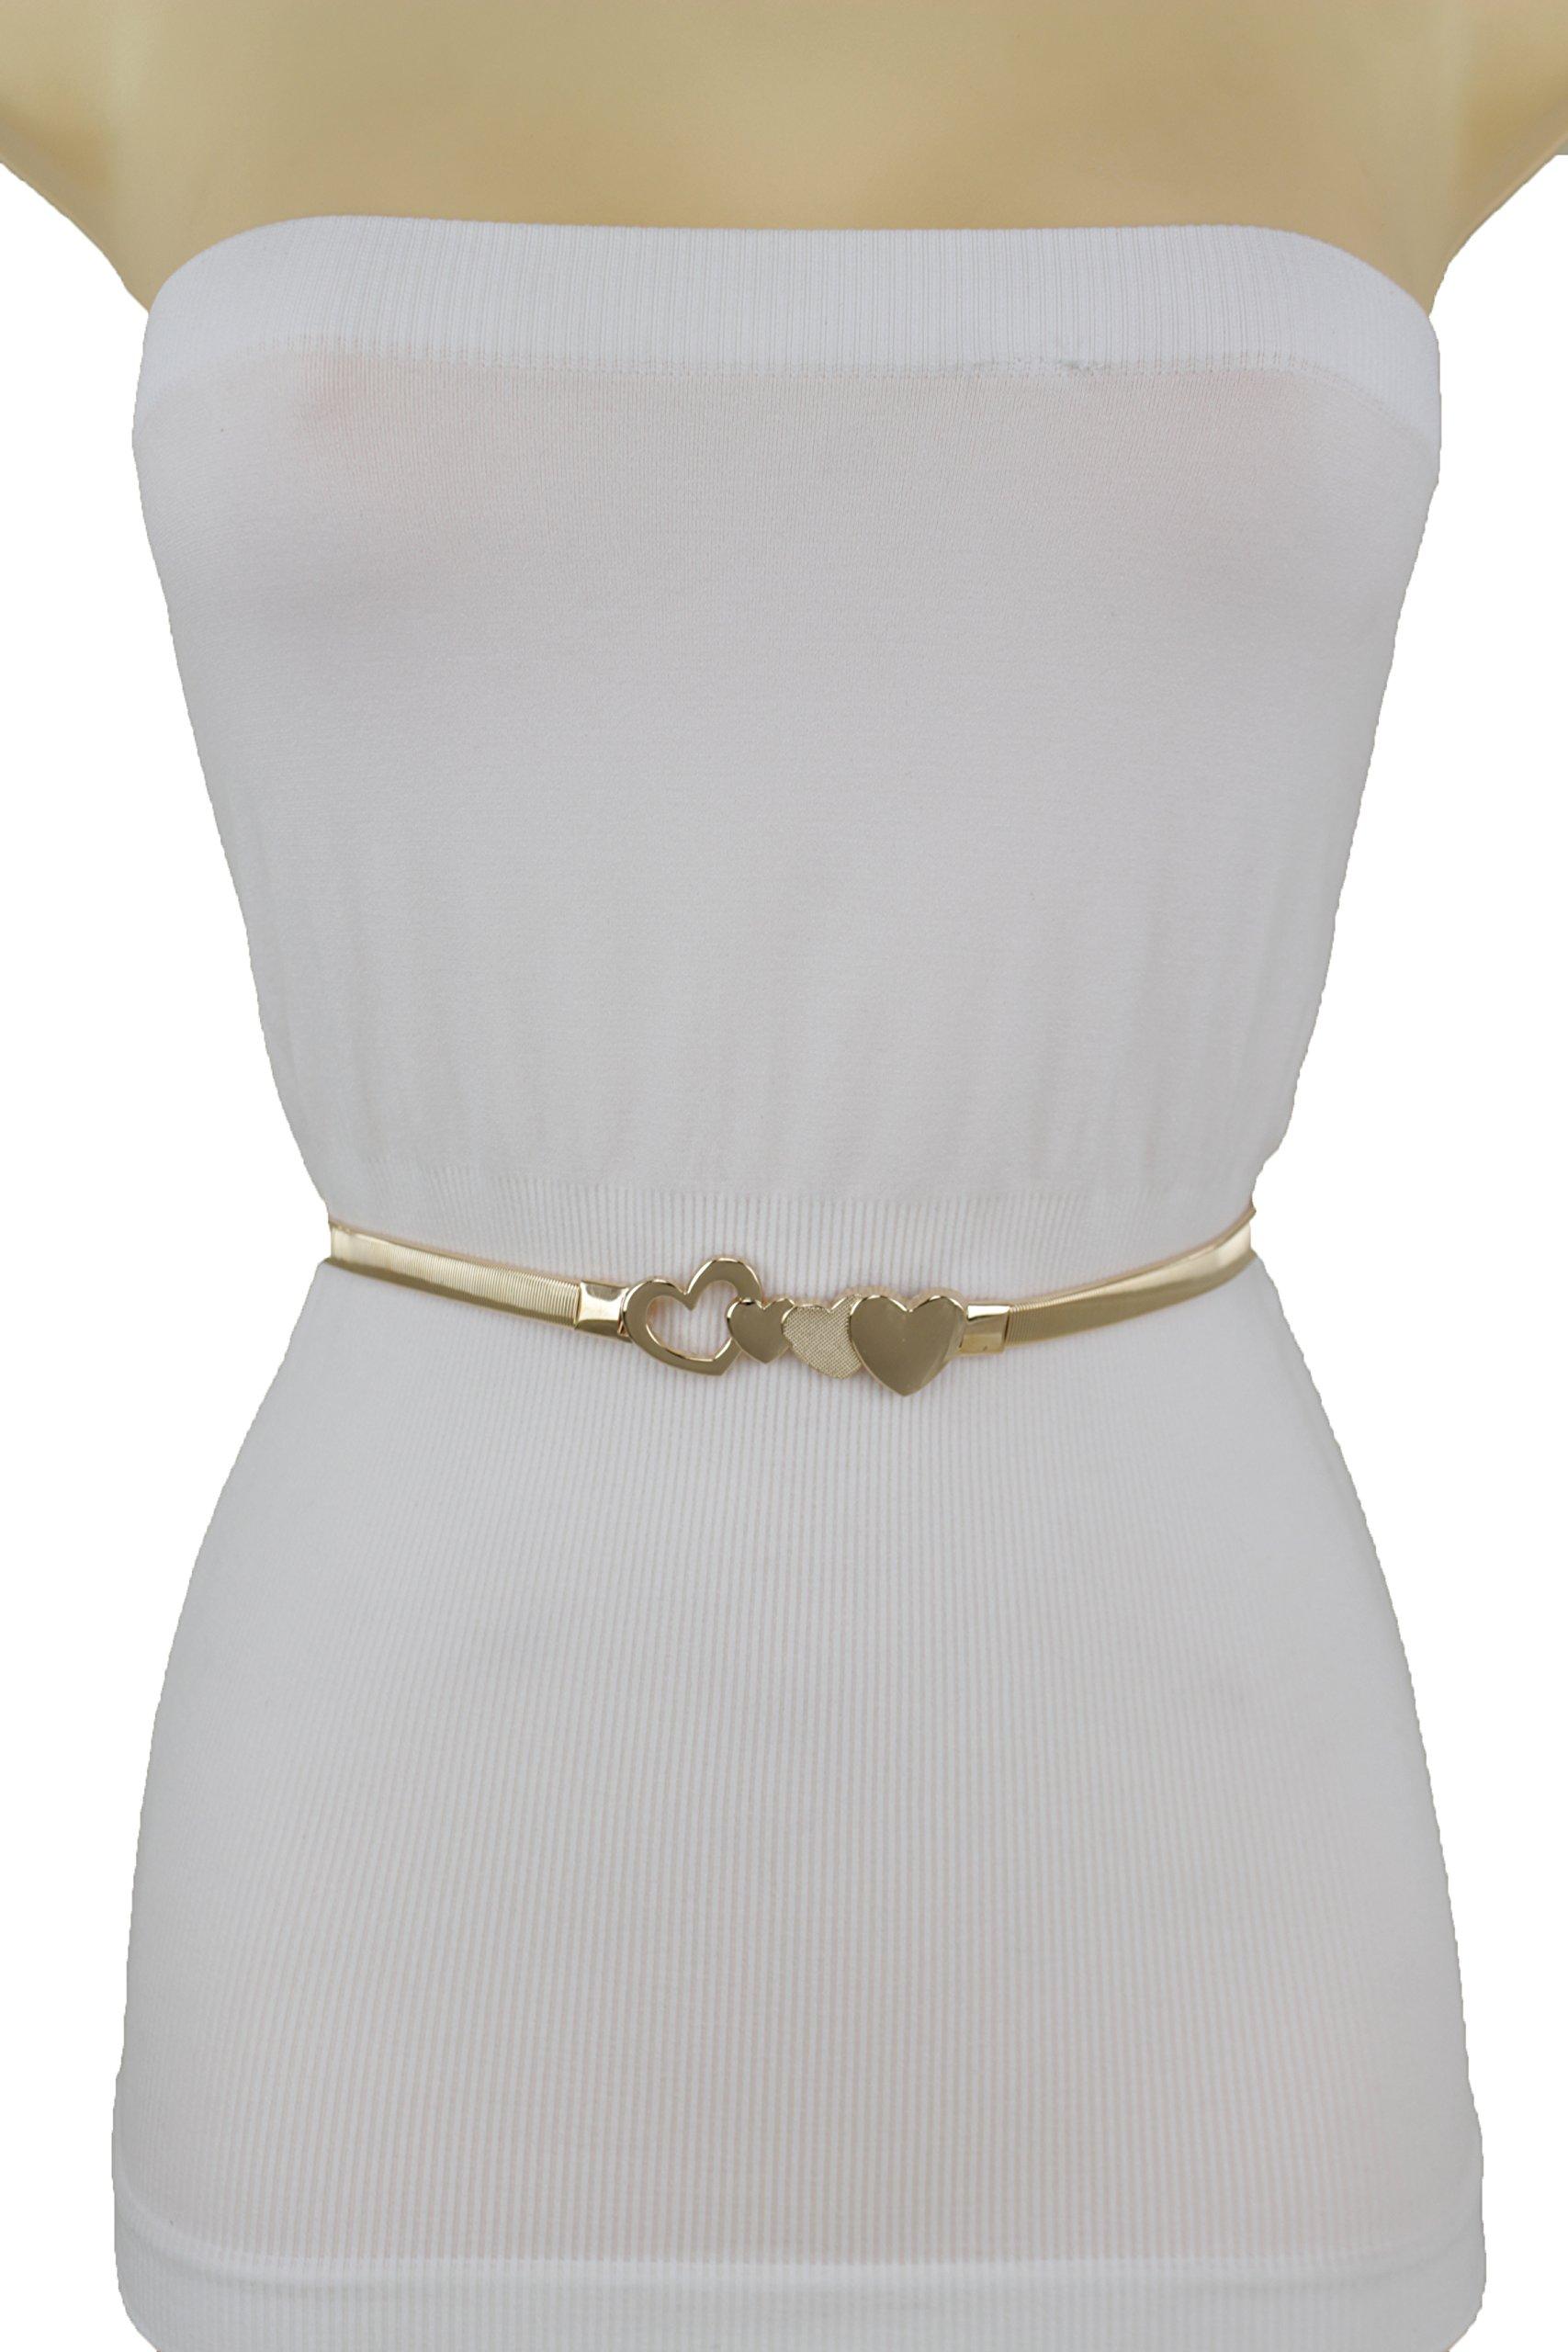 TFJ Women Skinny Gold Metal Stretch Belt Hip Waist Heart Buckle Size S M L